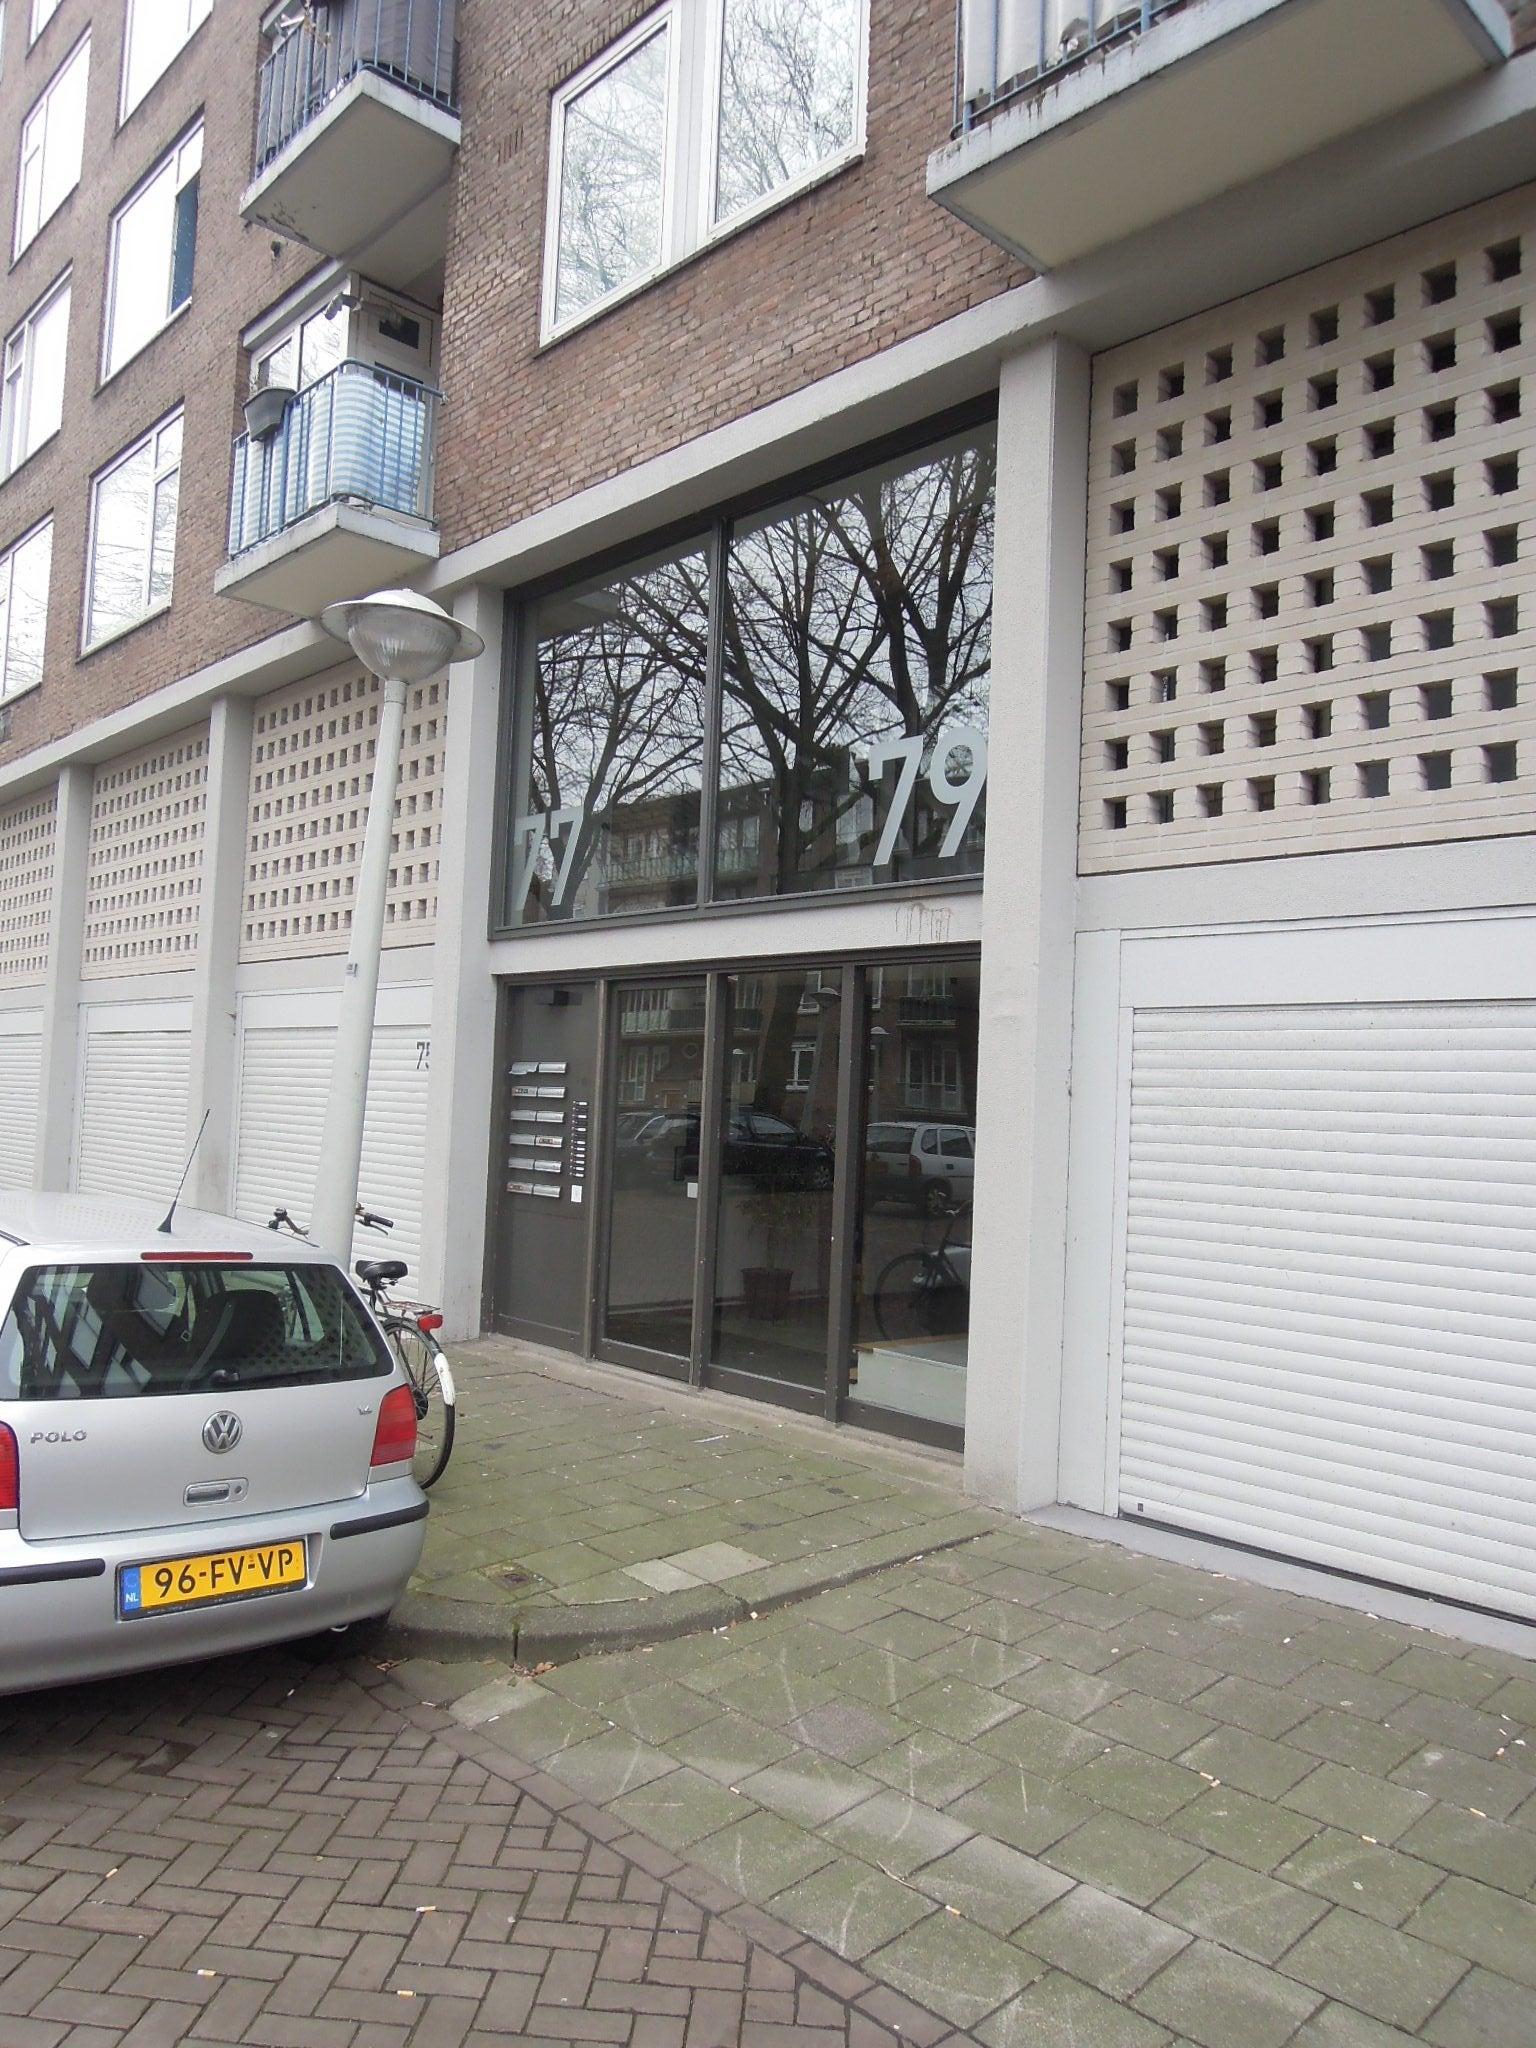 Amsterdam, Jephtastraat